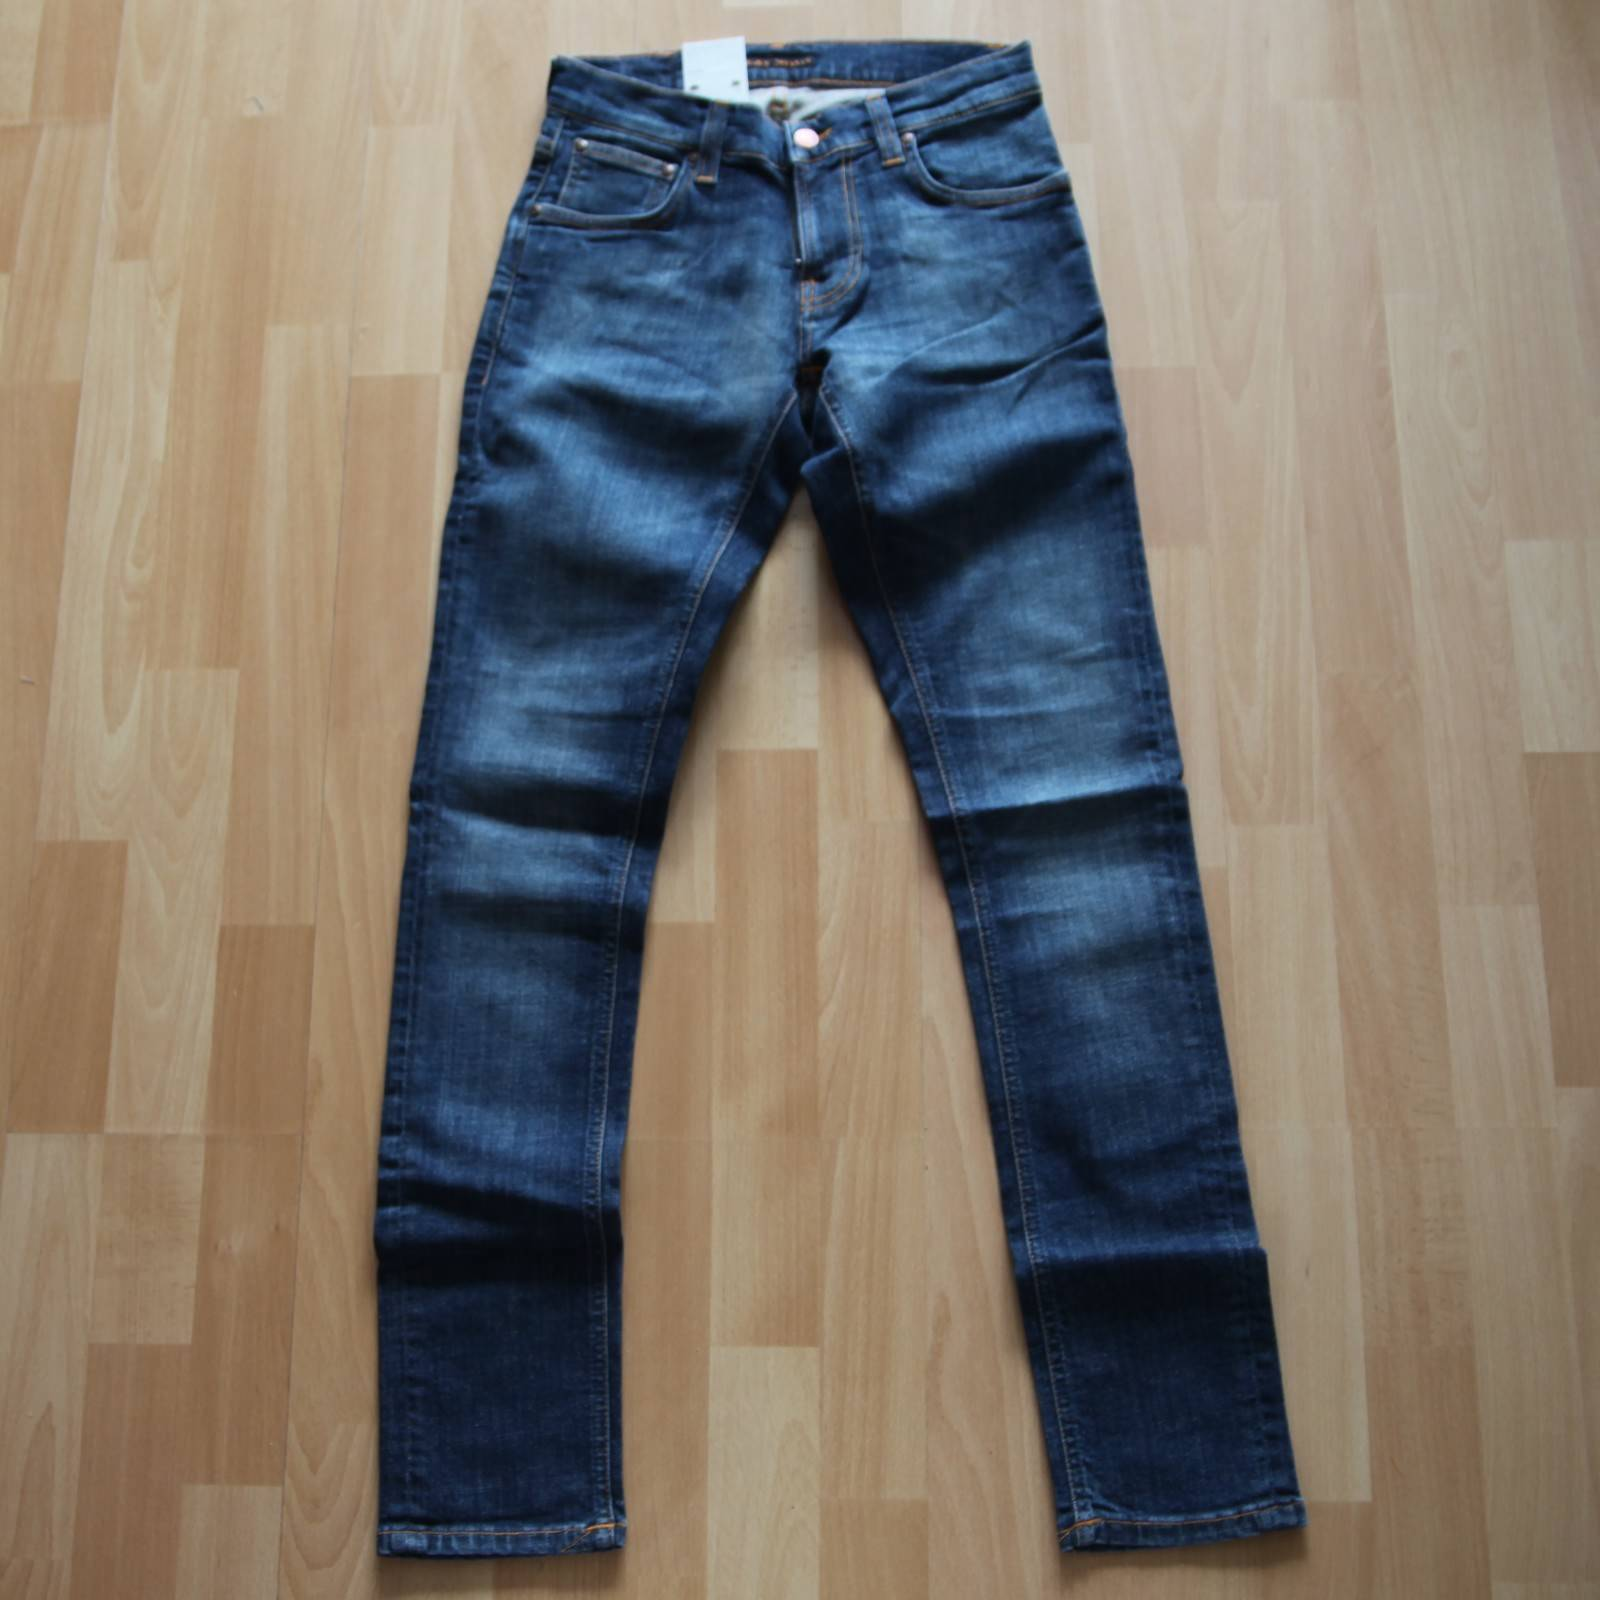 NEU Nudie Jeans Tight Terry (Tight Antifit) Organic Dark Pacific 28 32